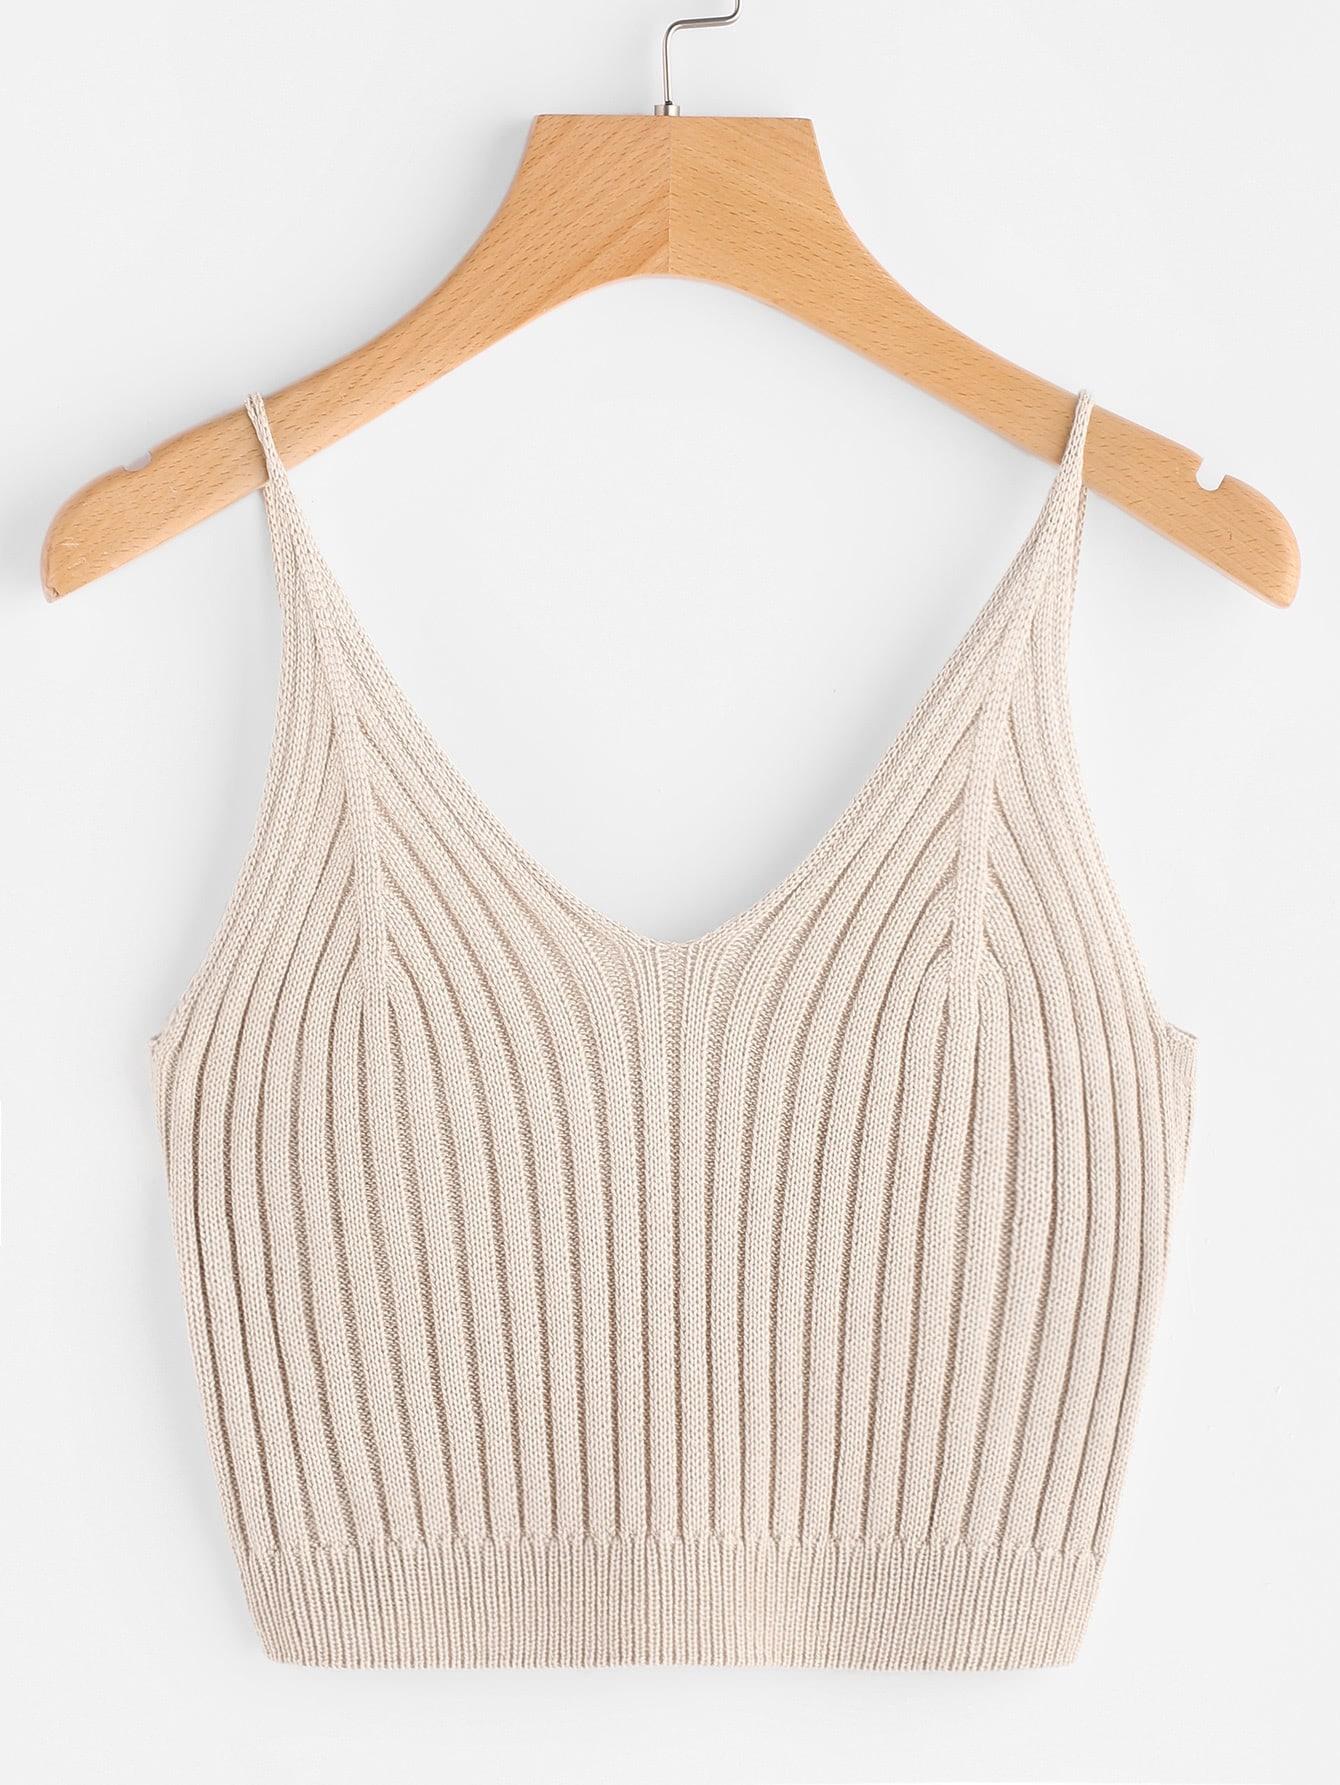 Rib Knit Crop Cami Top vest170425450